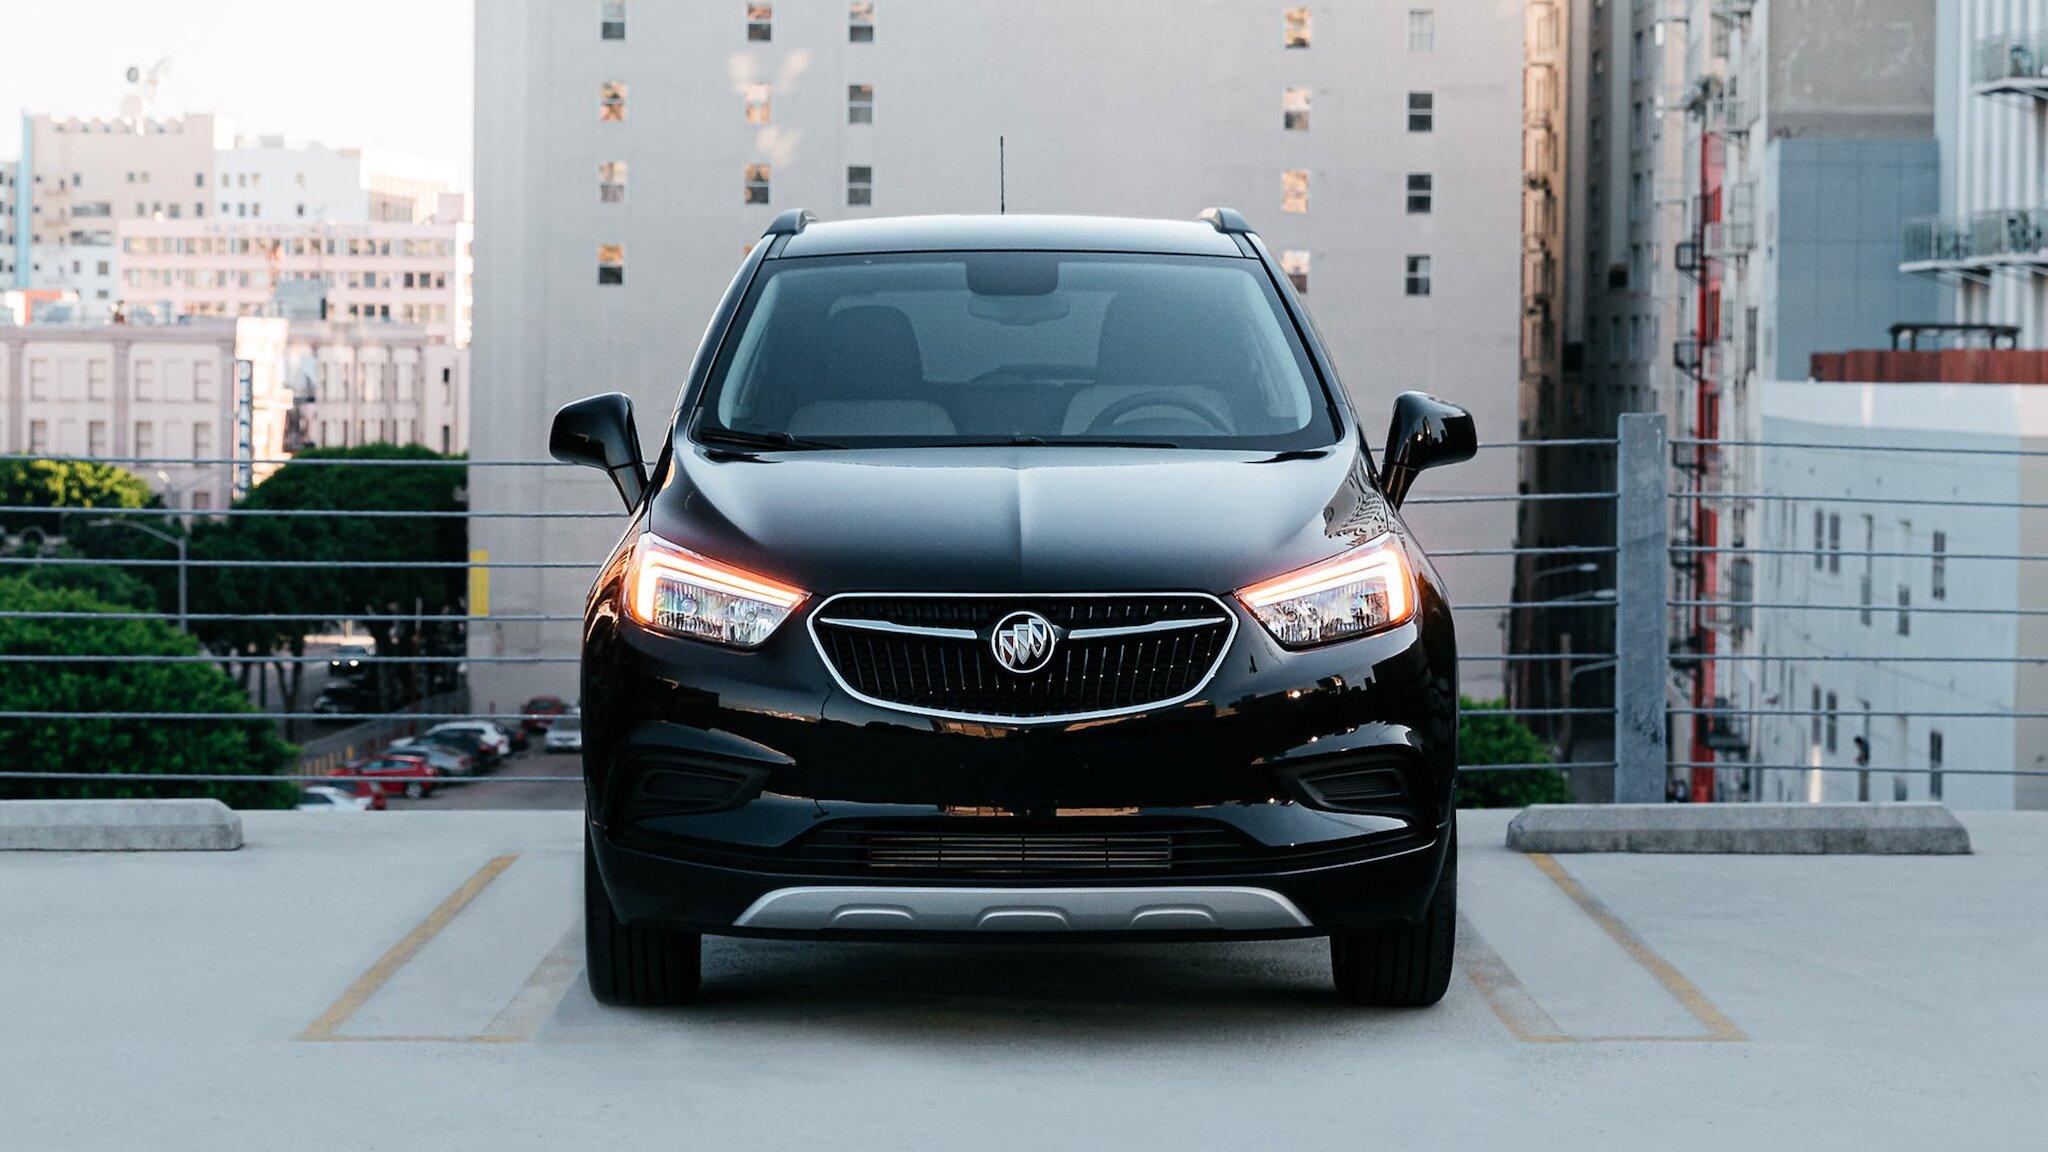 2020 Buick Encore for Sale in Fort Gratiot, MI